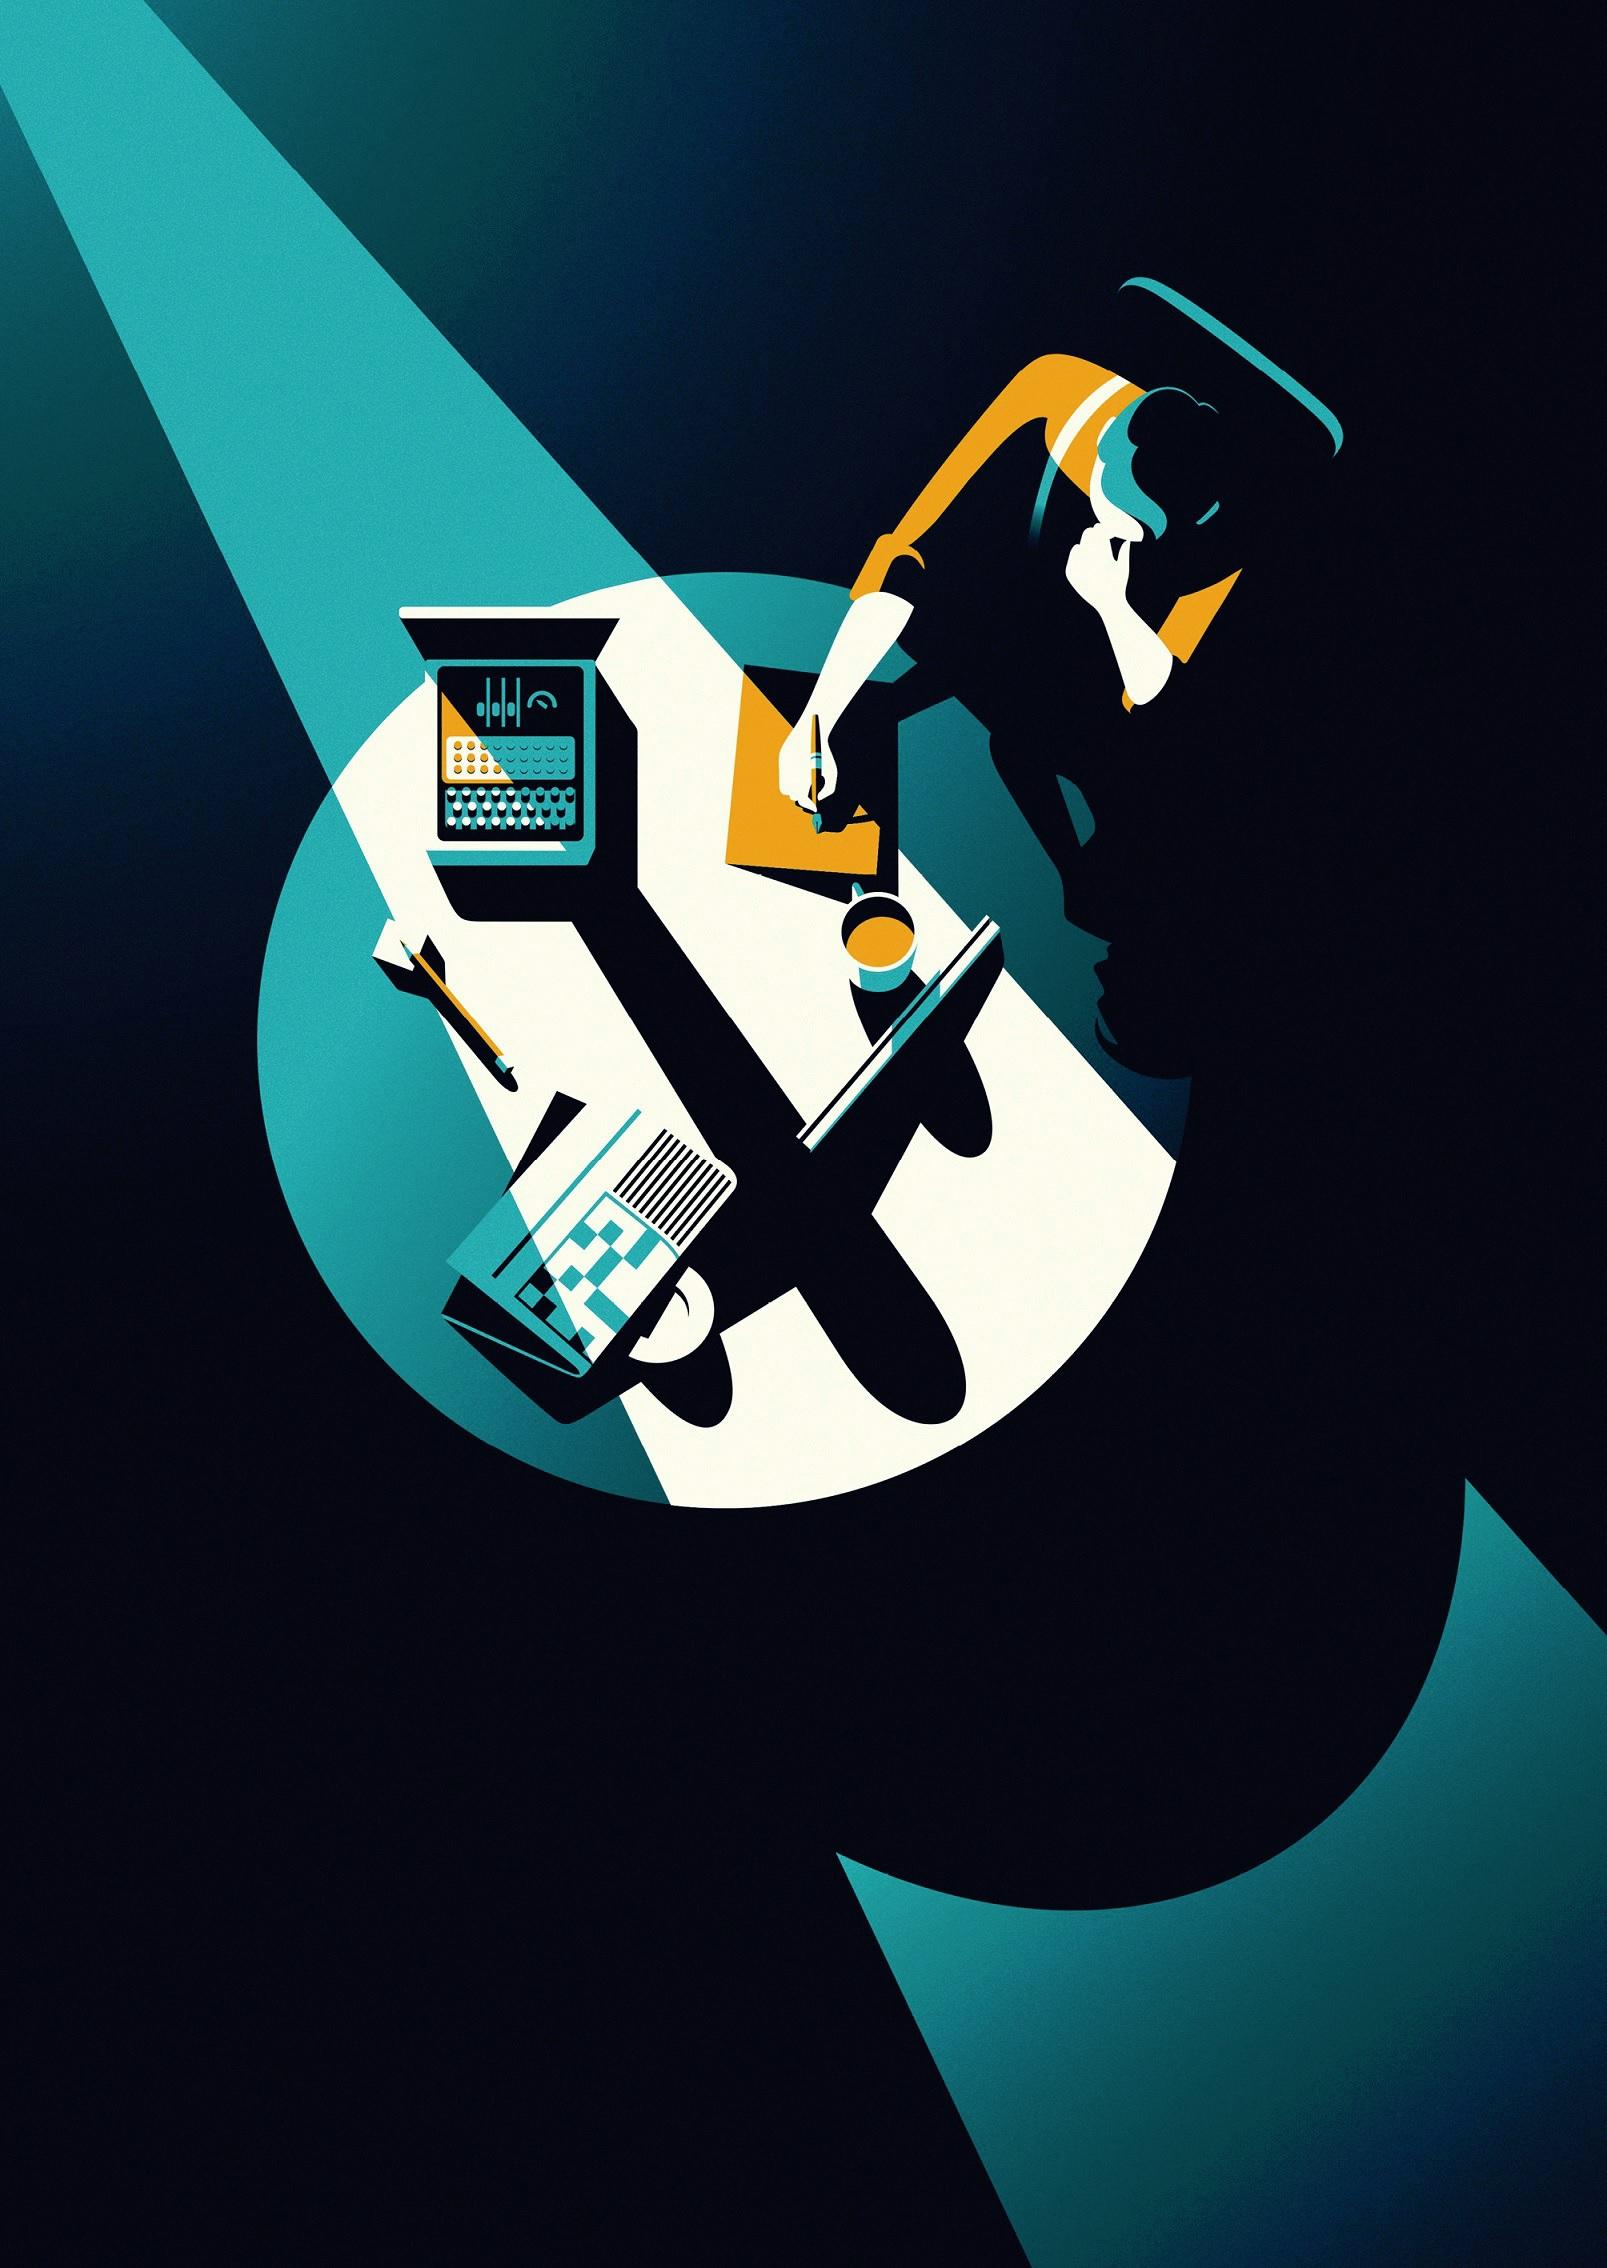 Malika Favre BAFTA Imitation Game Poster